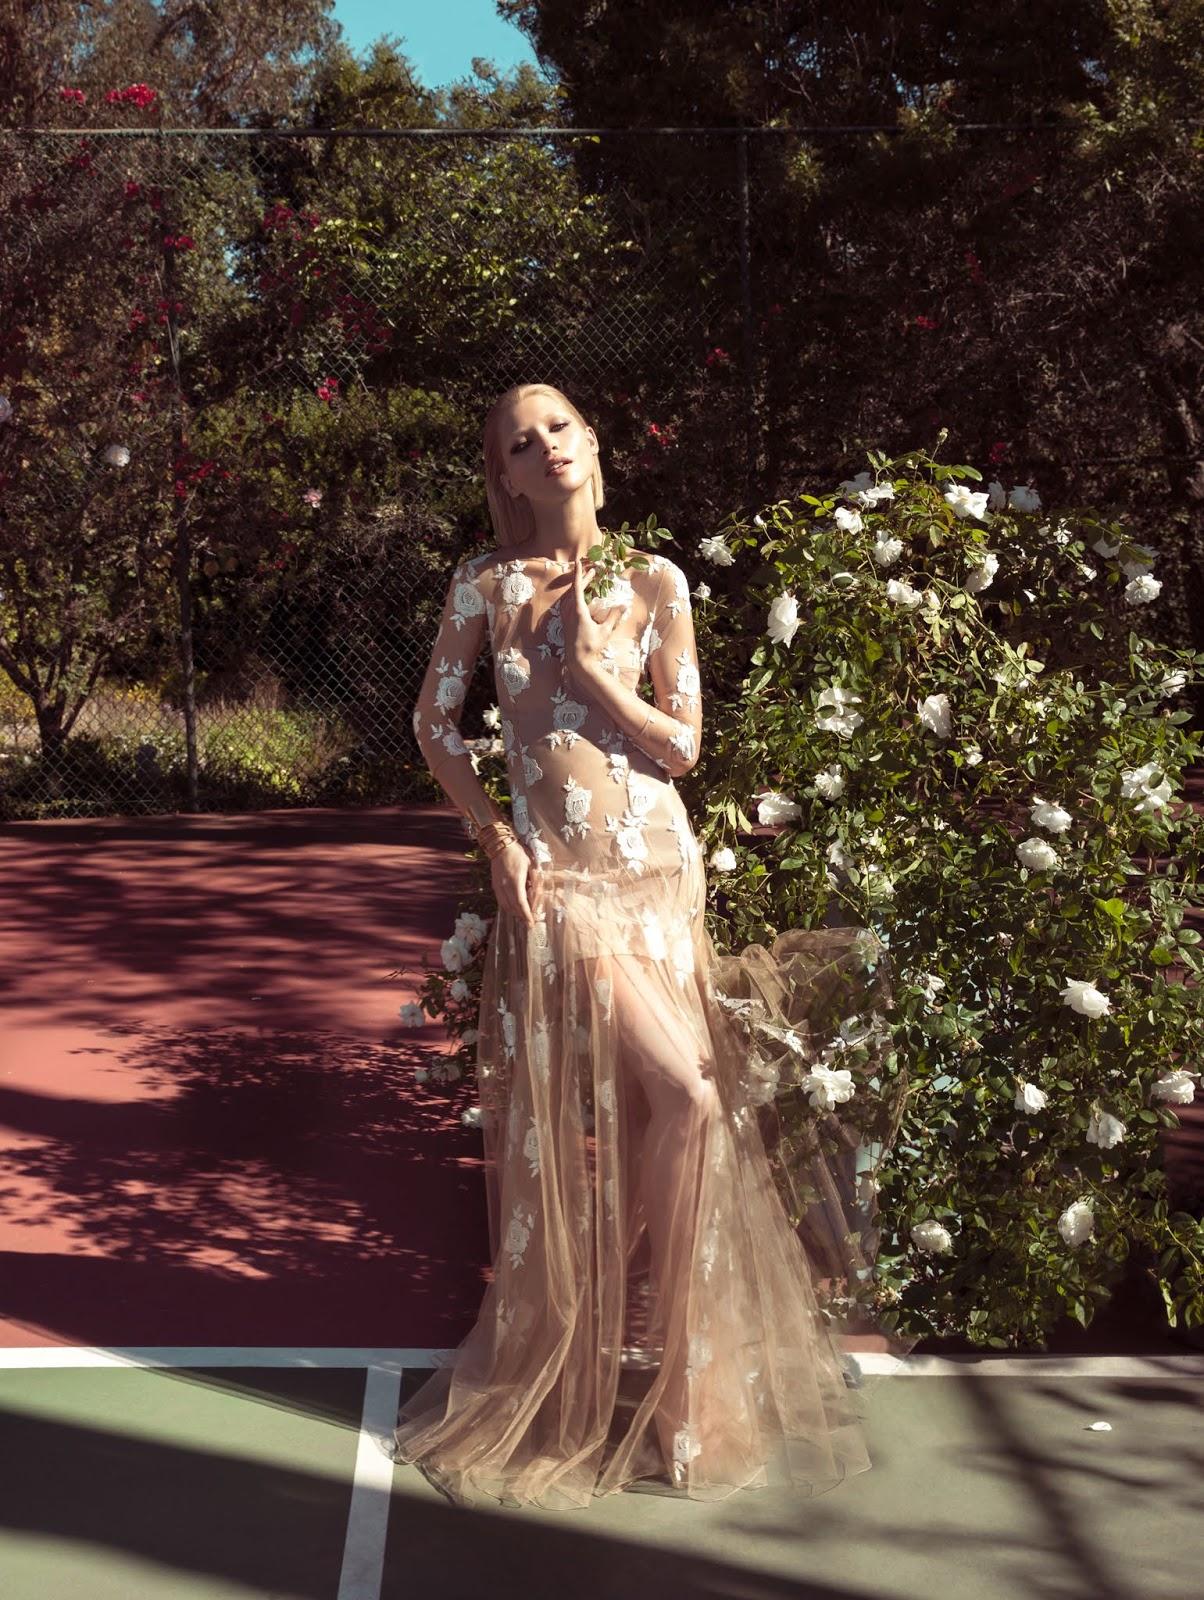 Hana Jirickova wearing Blumarine lace dress in Peach Blush editorial photographed by Camilla Akrans for Vogue China March 2014 via fashioned by love british fashion blog